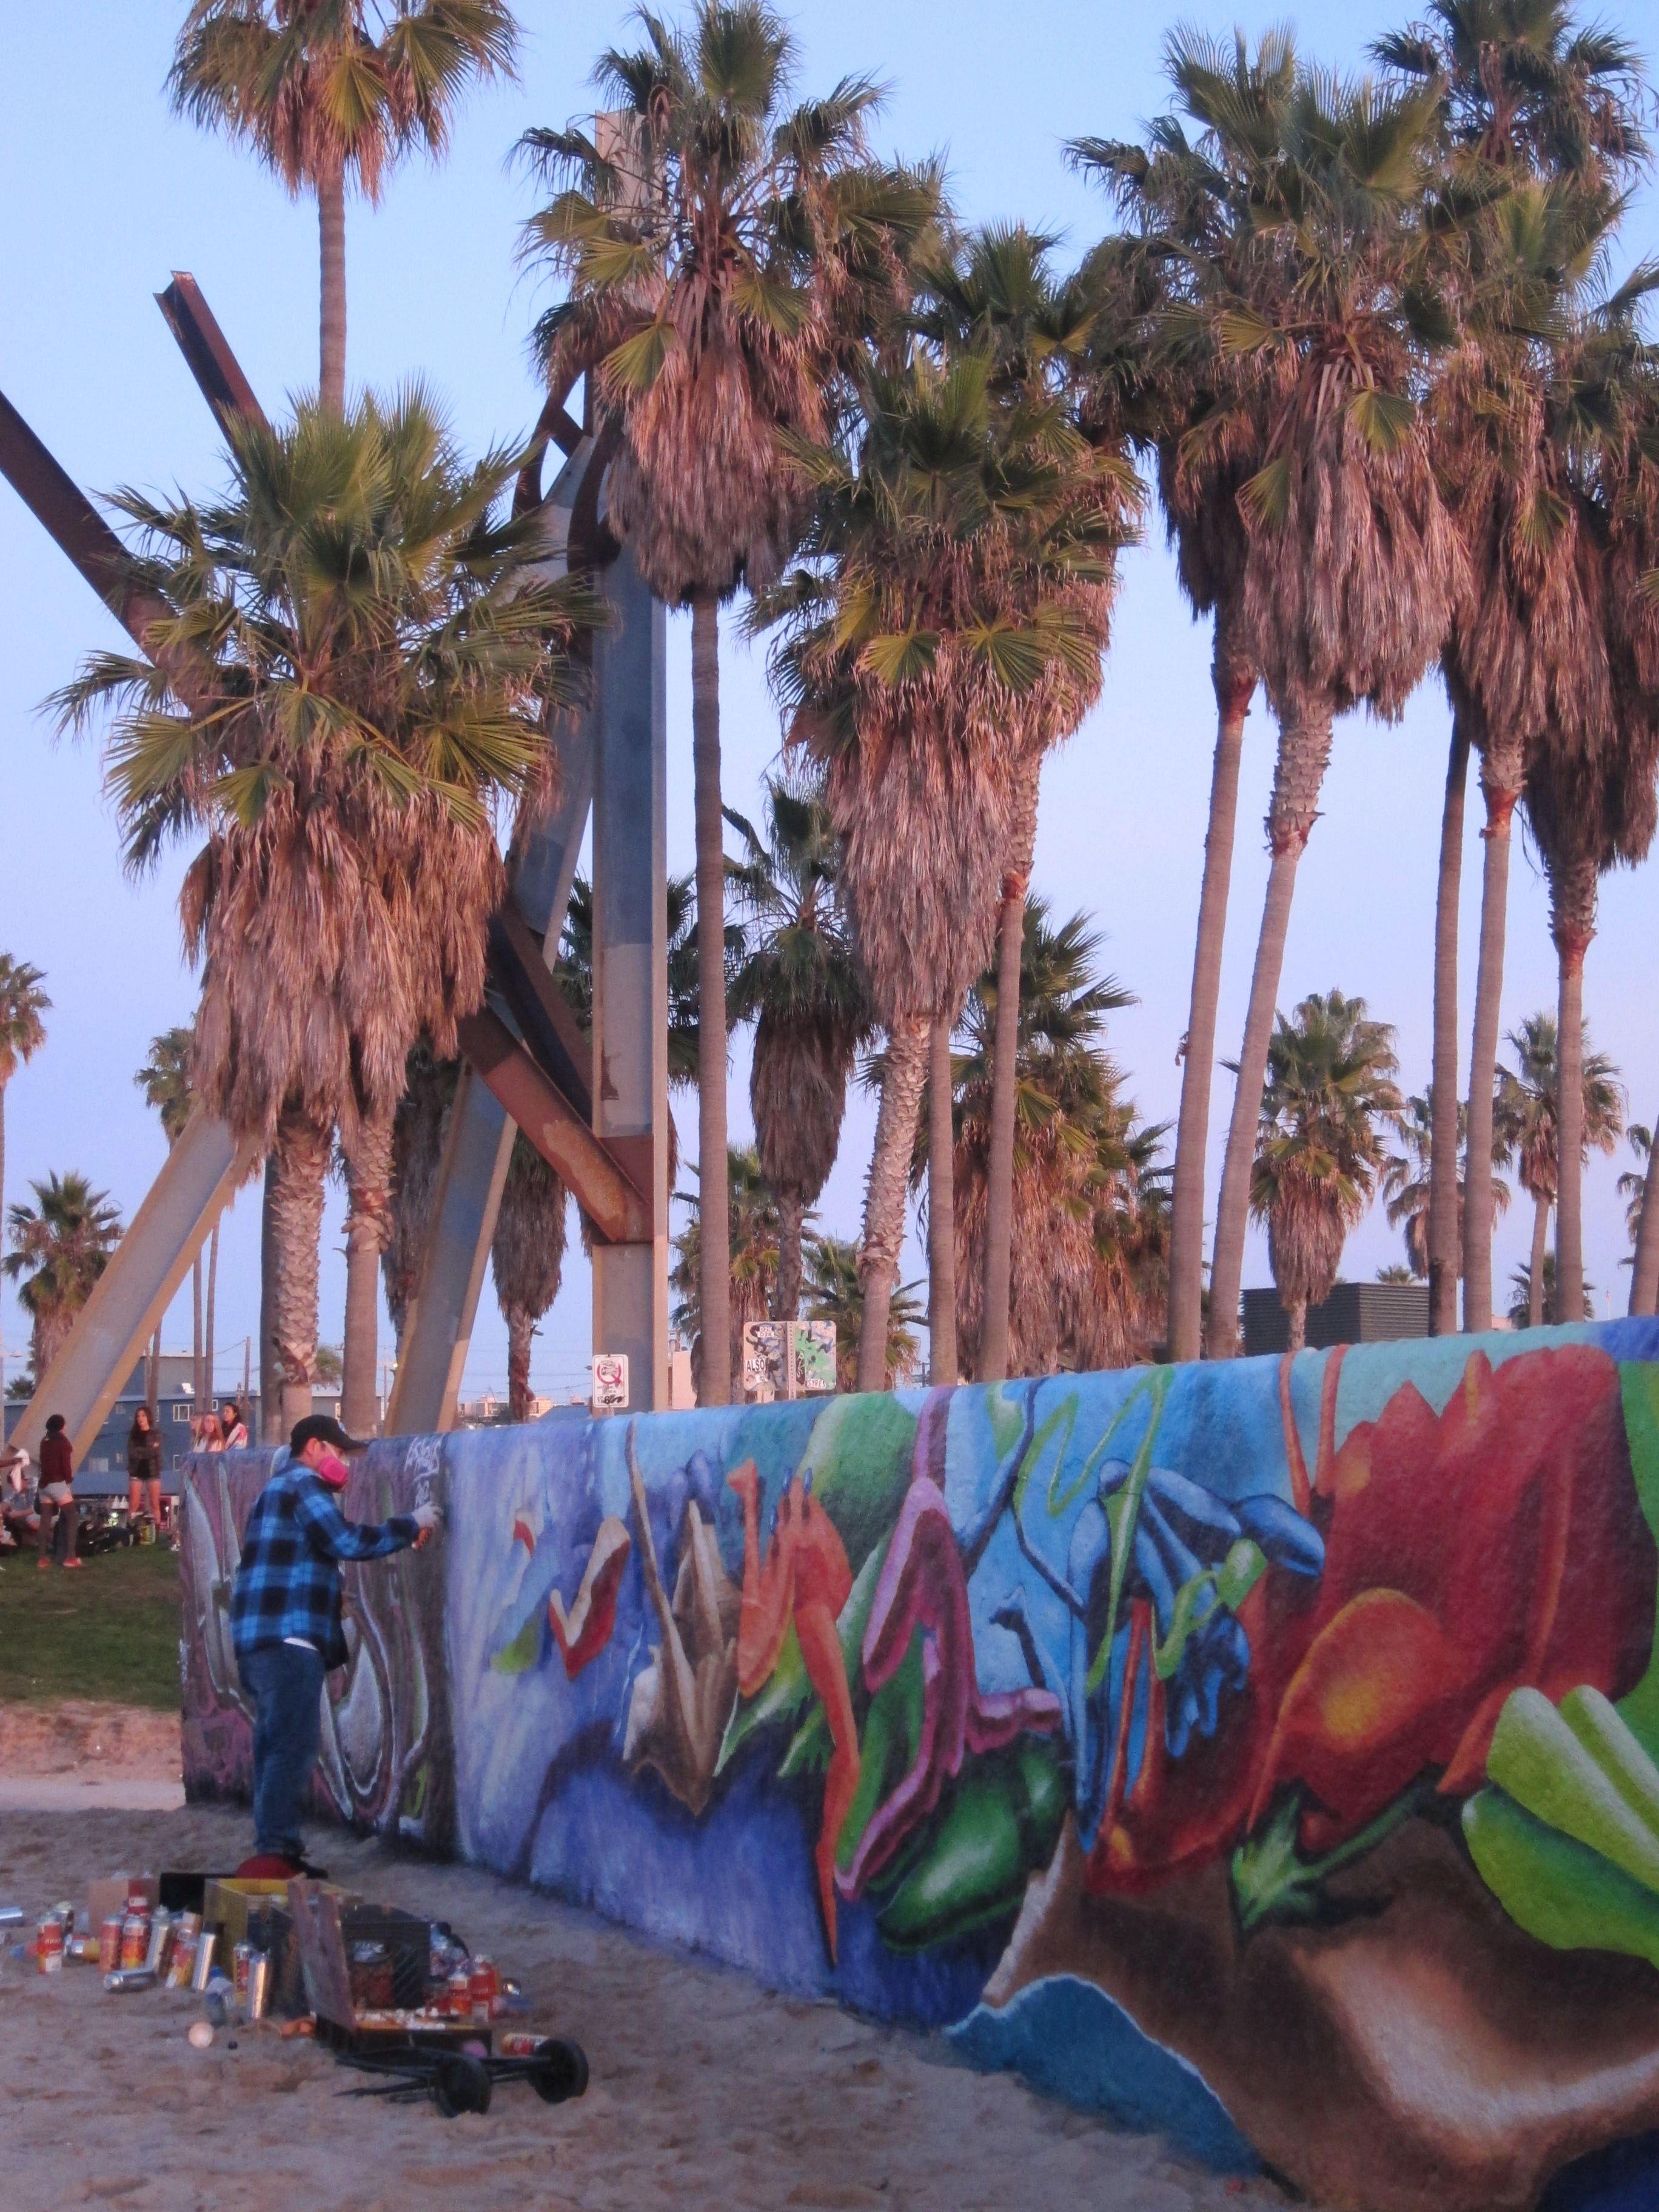 Venice Beach Graffiti Wall Http Adventuresinlaandbeyond Tumblr Com Post 15546578766 Sunday Sunset At The Venice Beach Graf Graffiti Wall Street Art Graffiti